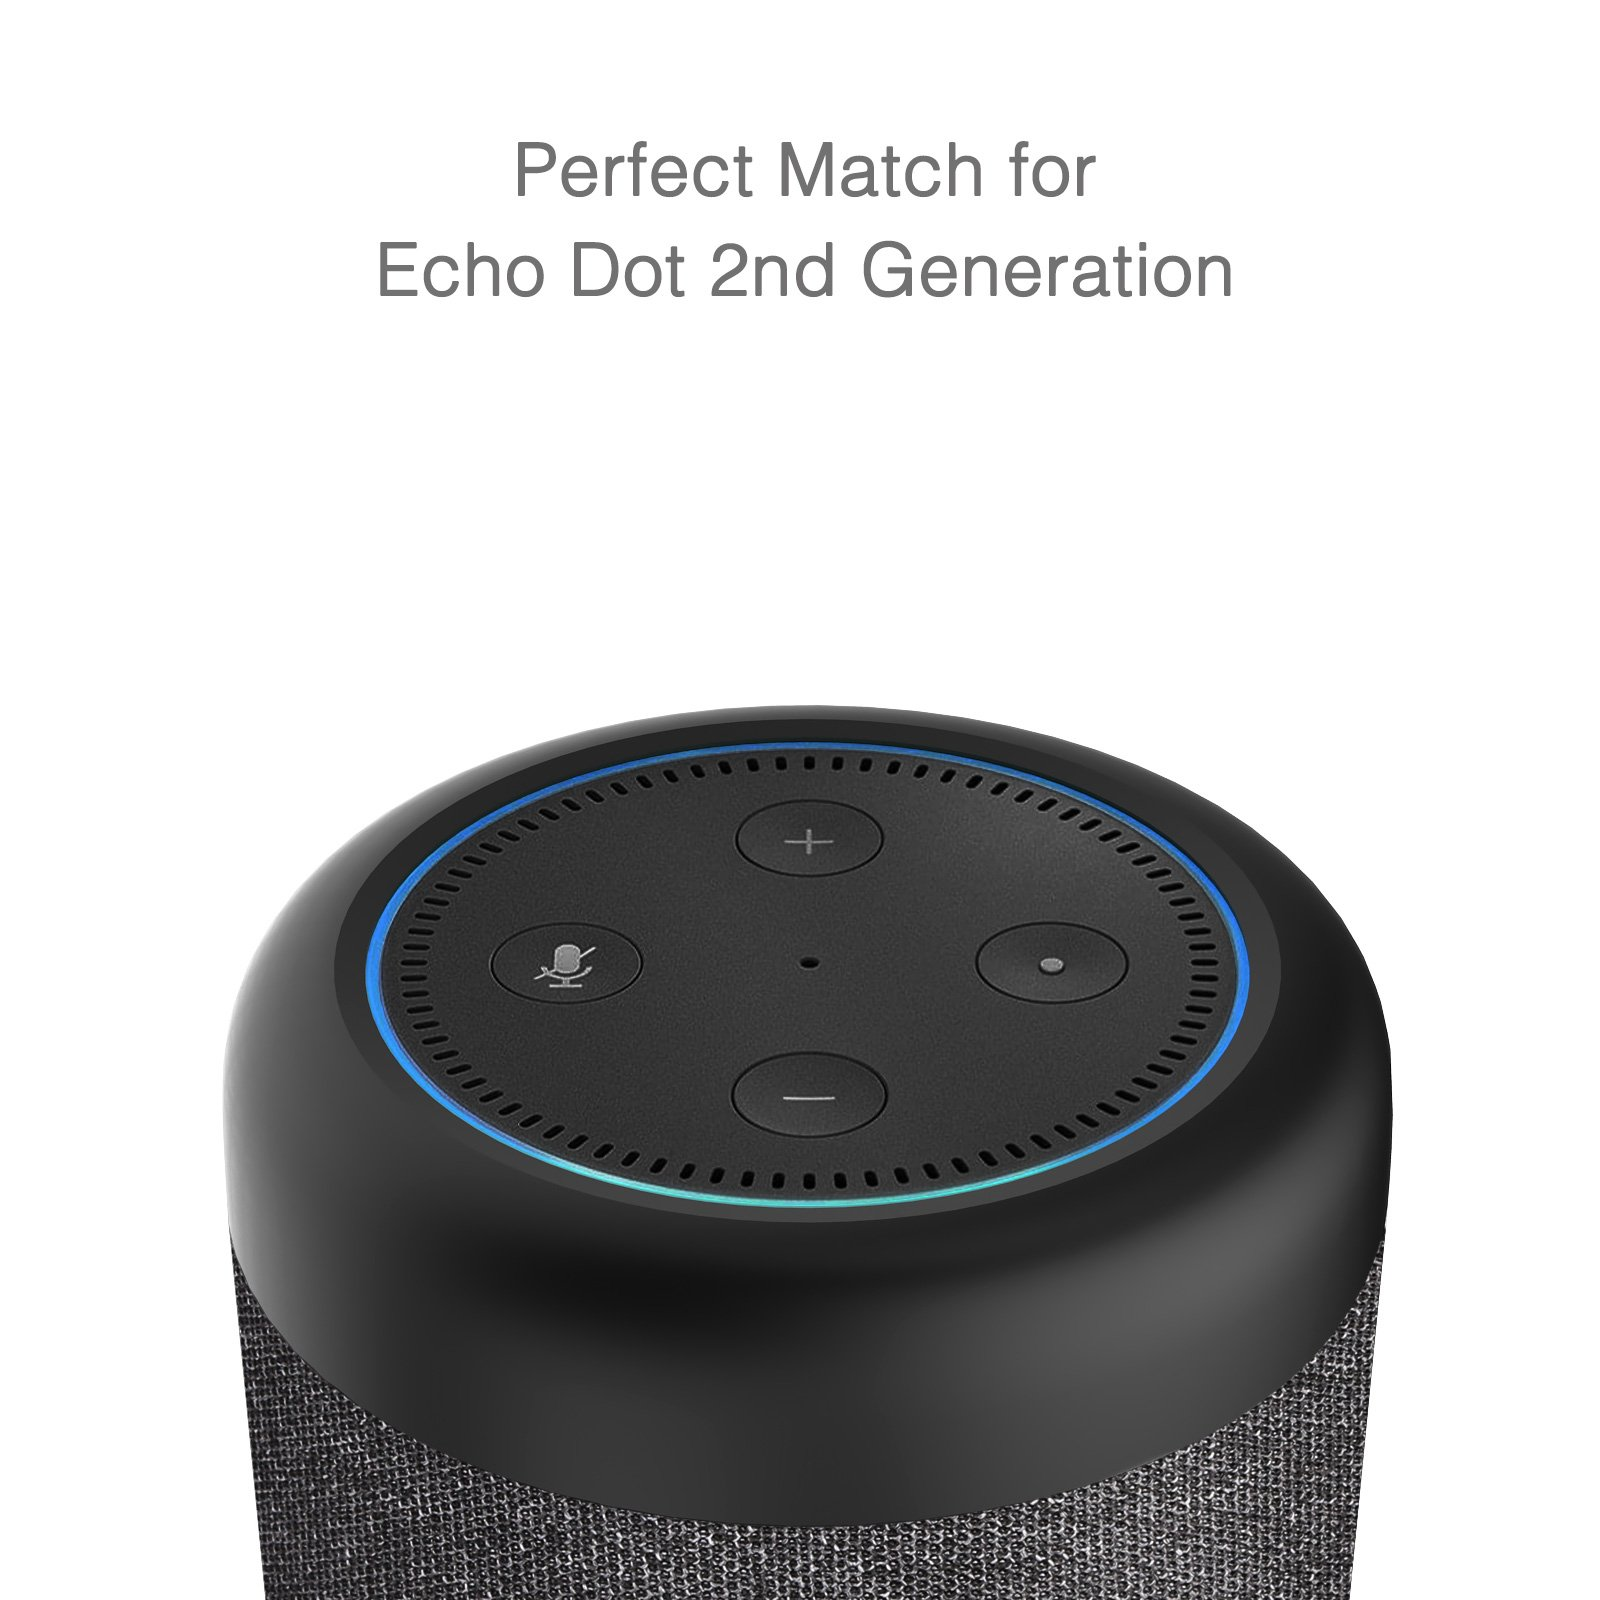 GGMM D6 Portable Speaker for Amazon Echo Dot 2nd Generation, 20W Powerful True 360 Alexa Speakers (DOT SOLD SEPARATELY) by GGMM (Image #4)